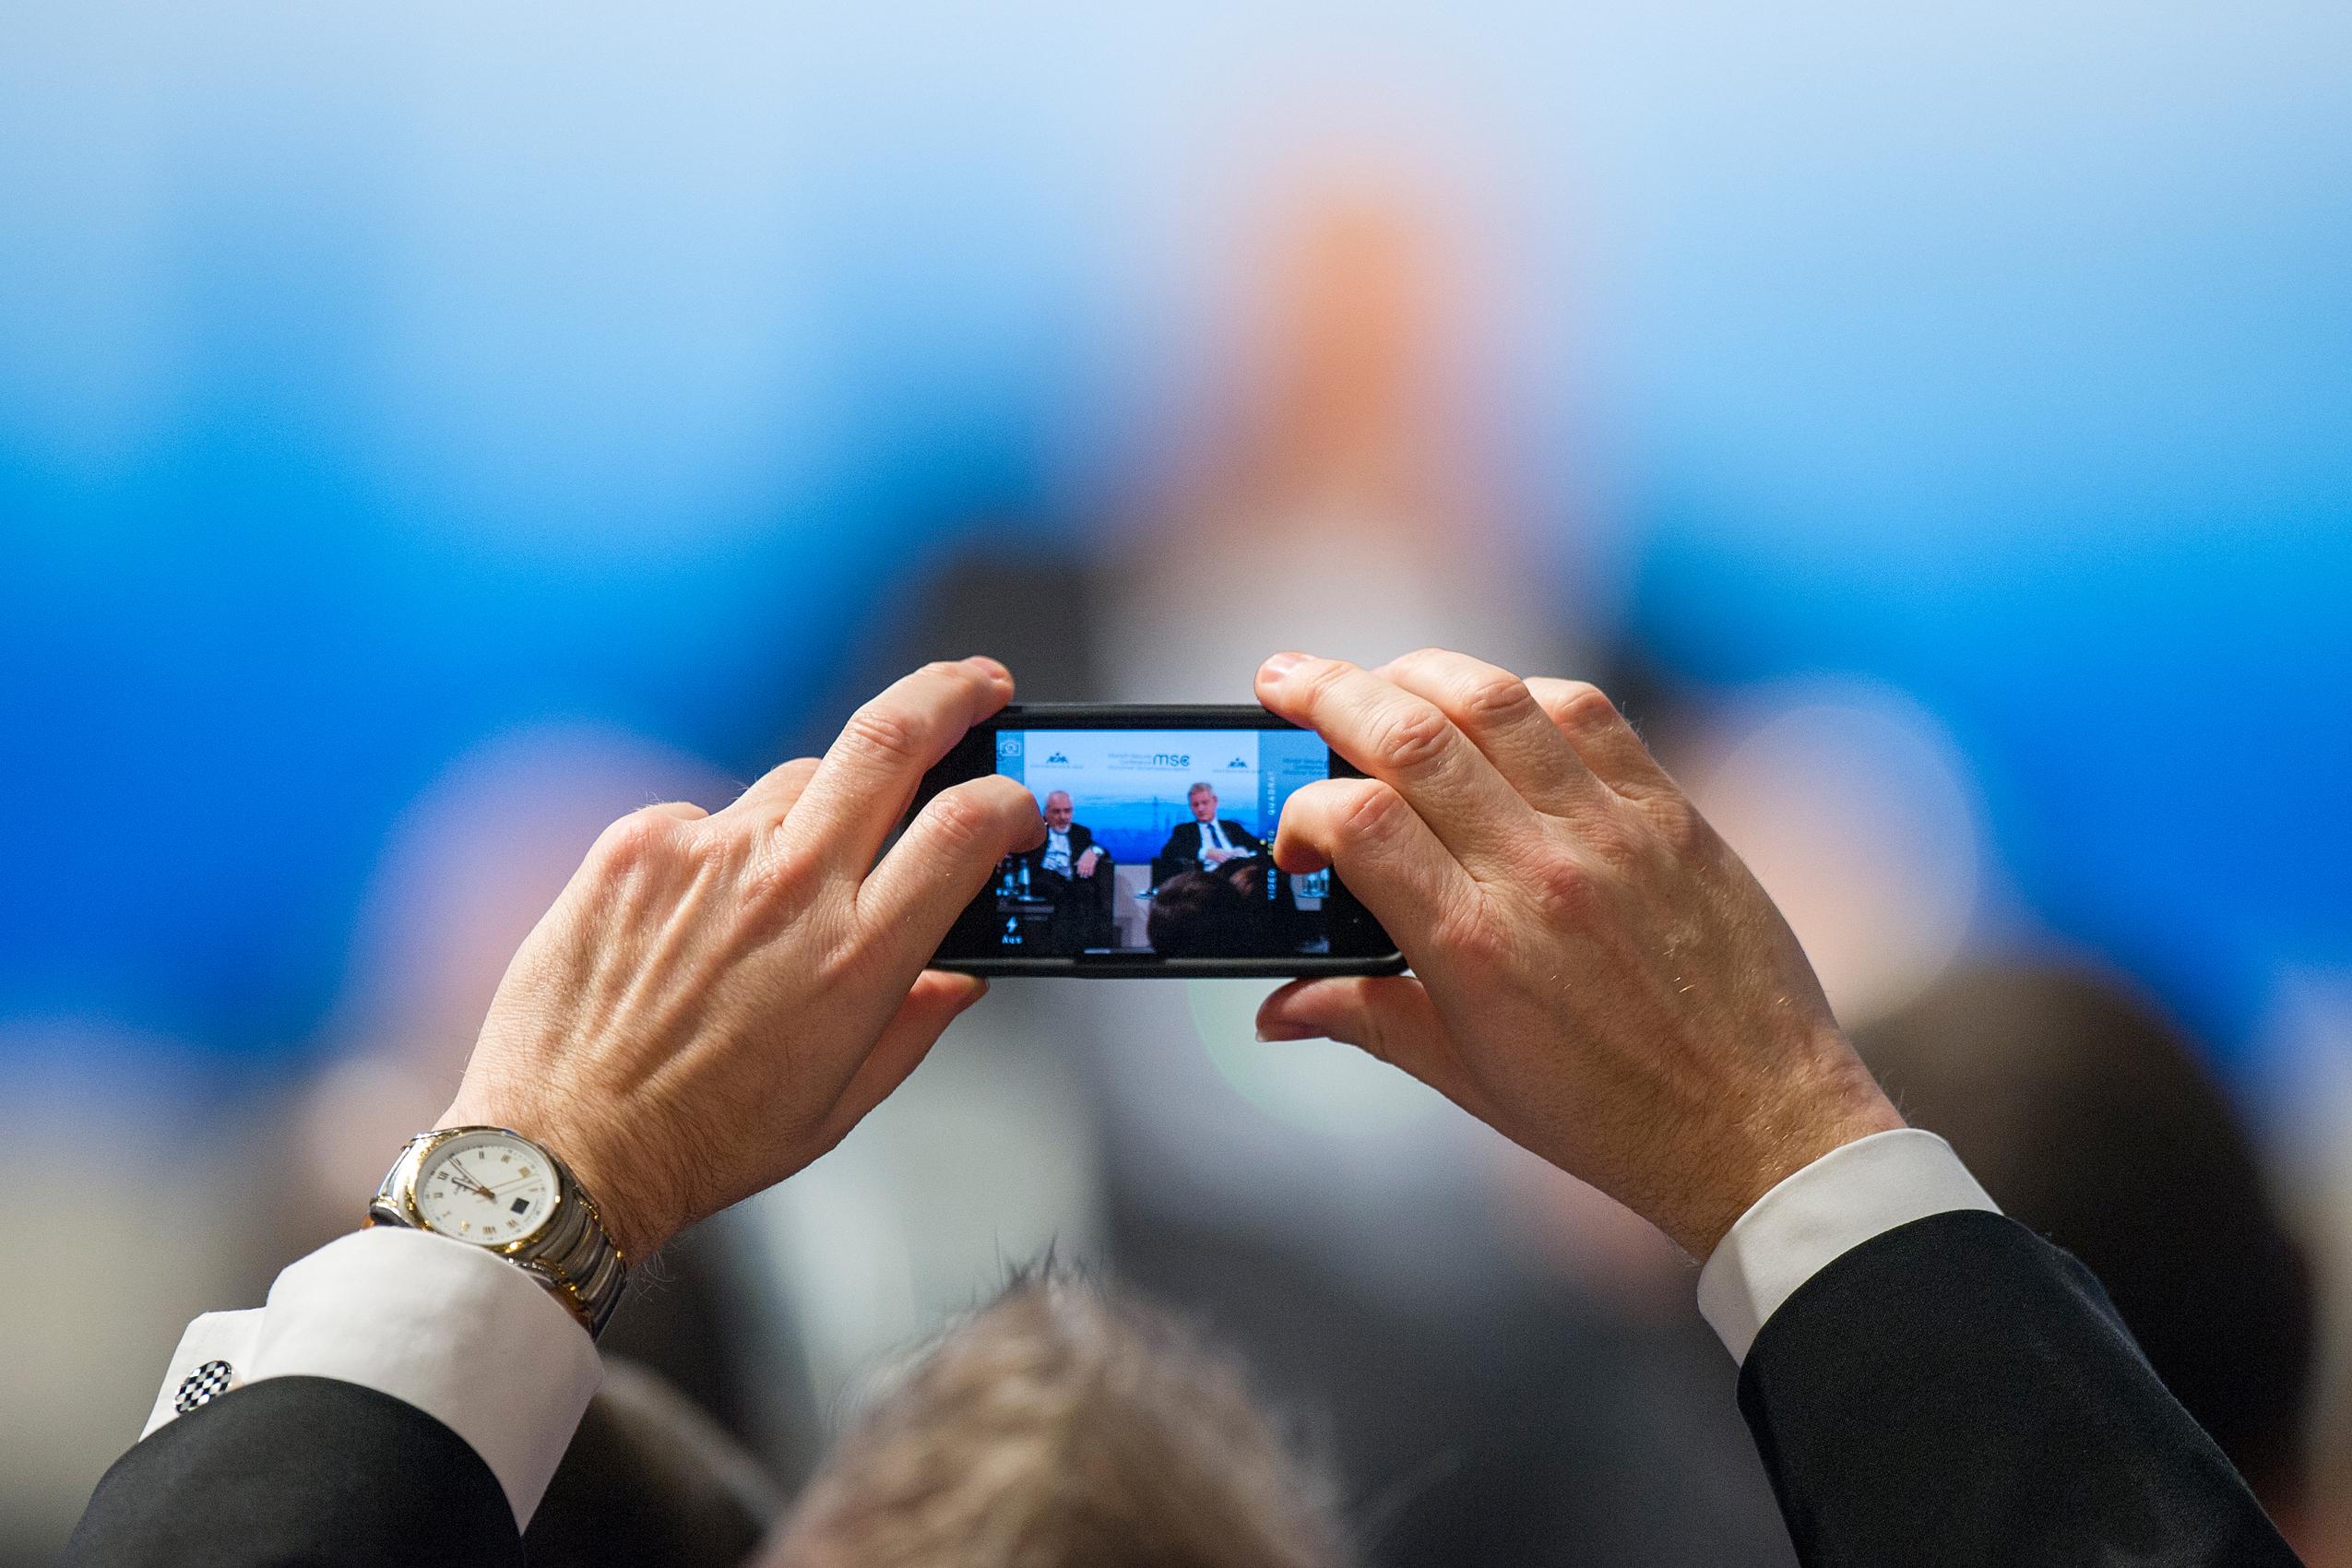 OTT Communications and Mobile